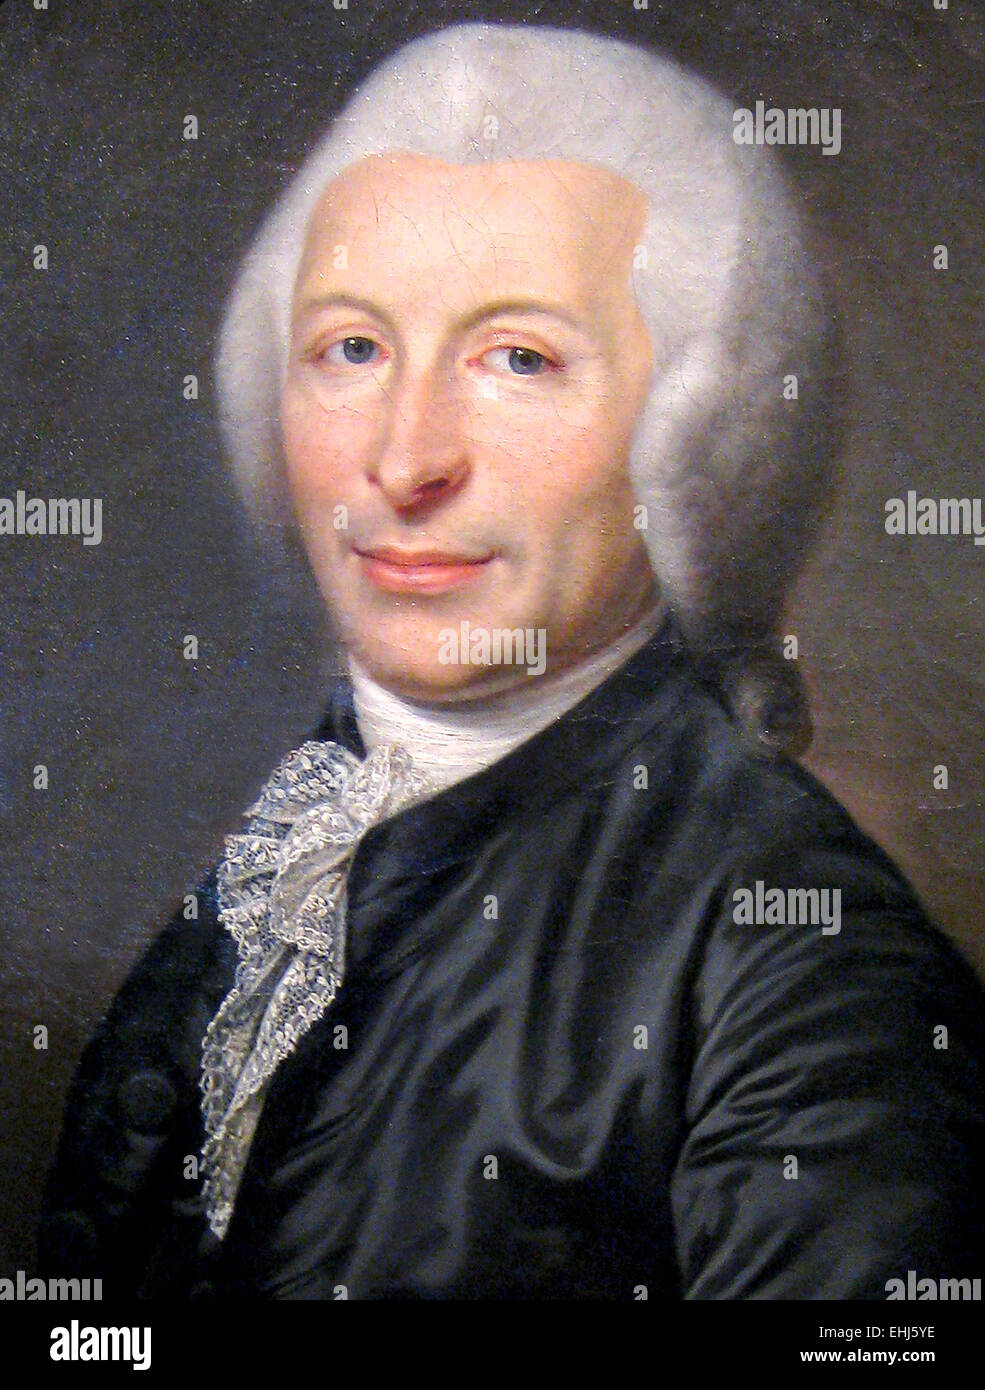 Dr. Joseph-Ignace Guillotin - Stock Image